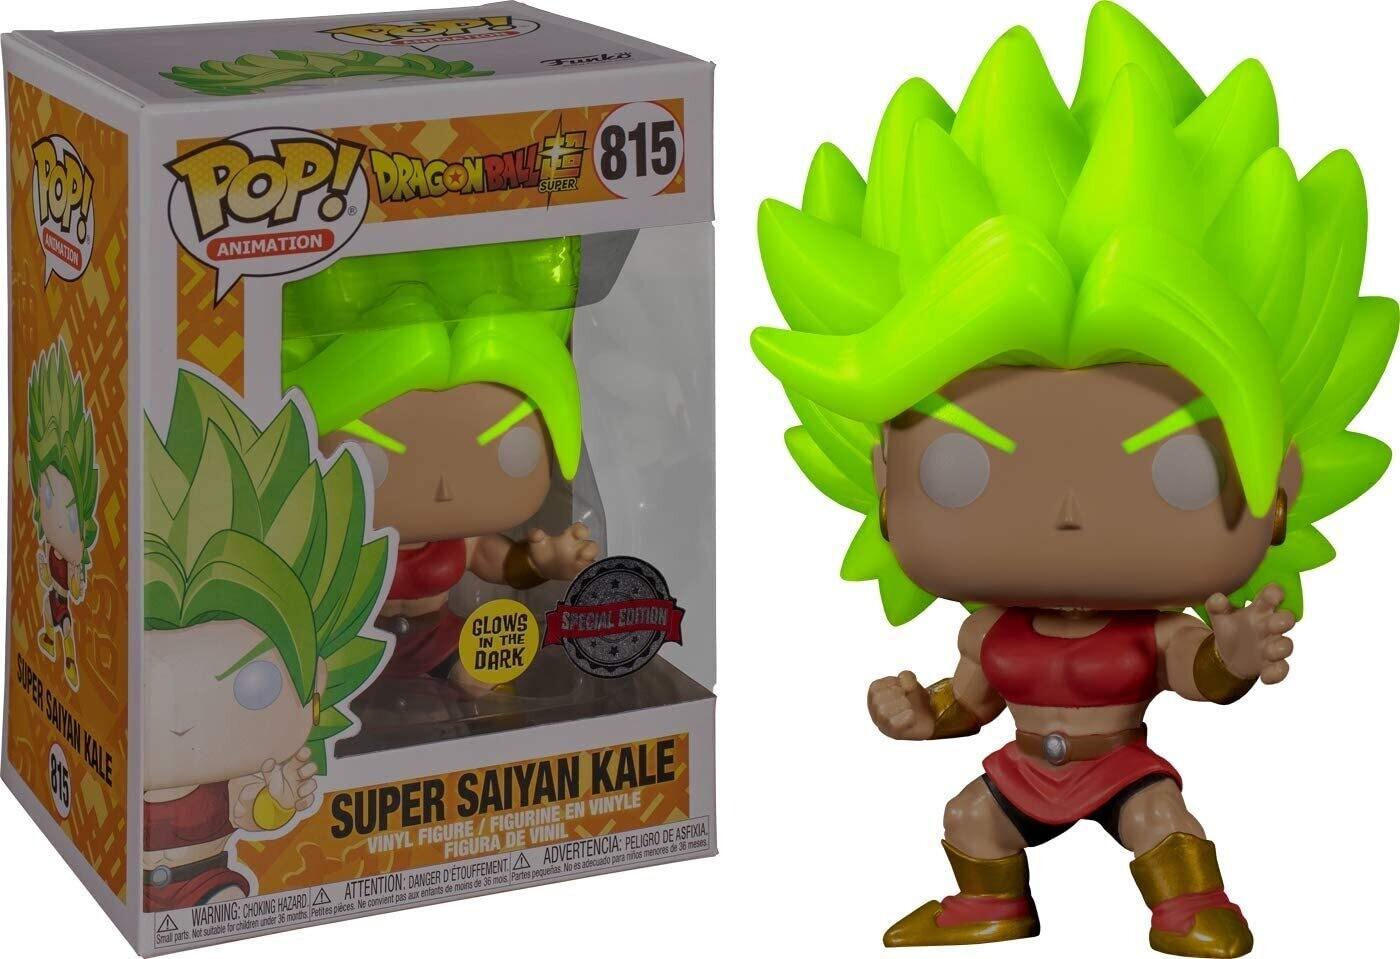 Super Saiyan Kale (Glow in the Dark) - Dragon Ball